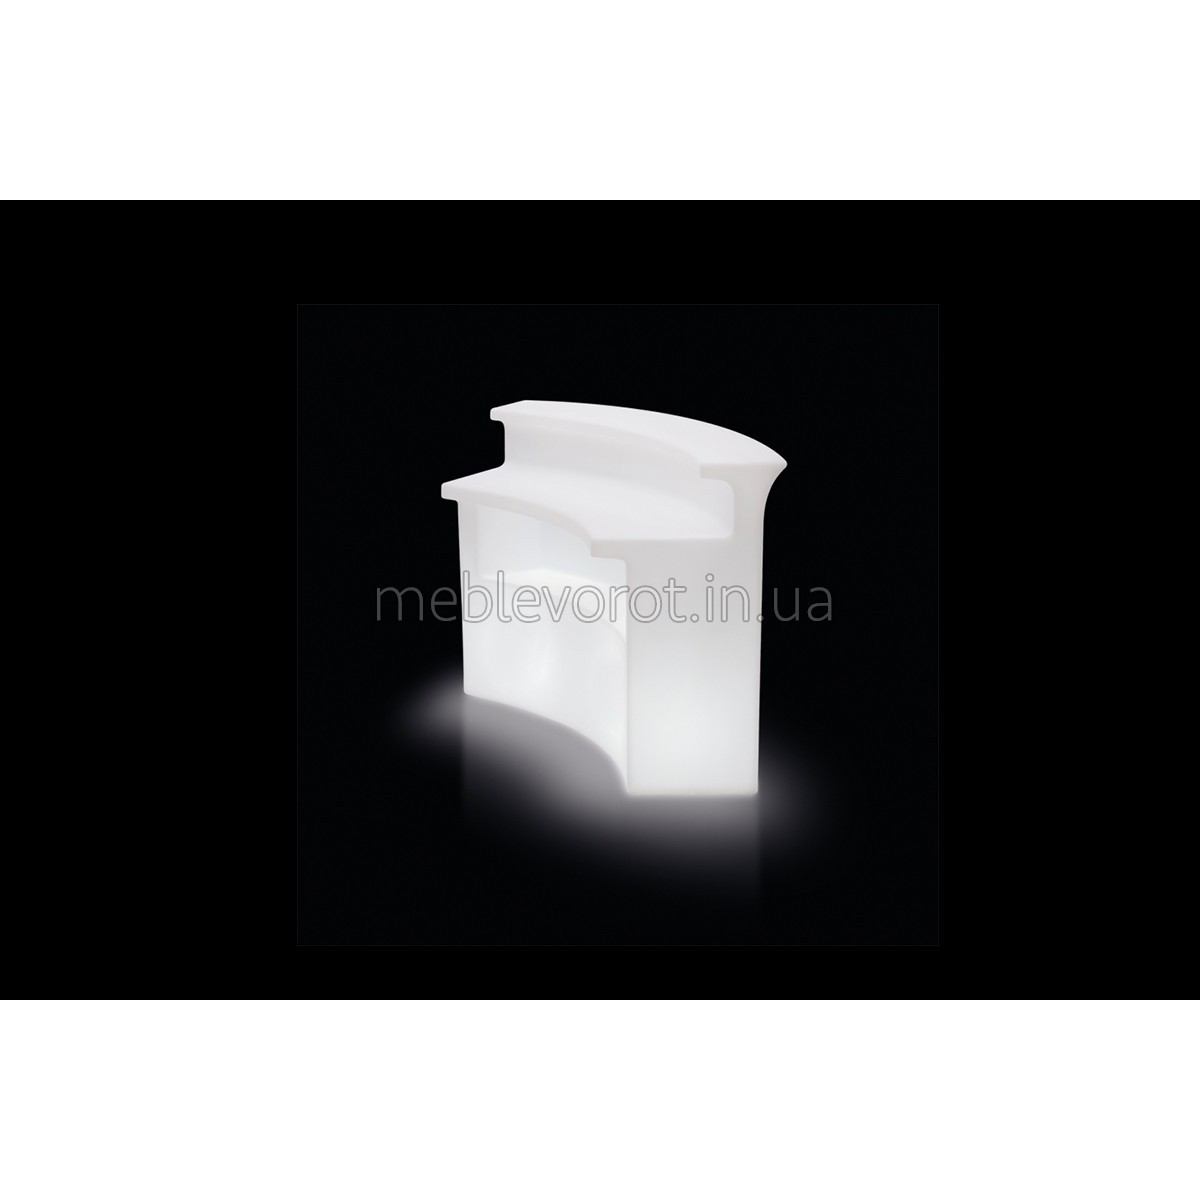 LED Стойка круглая (Аренда)